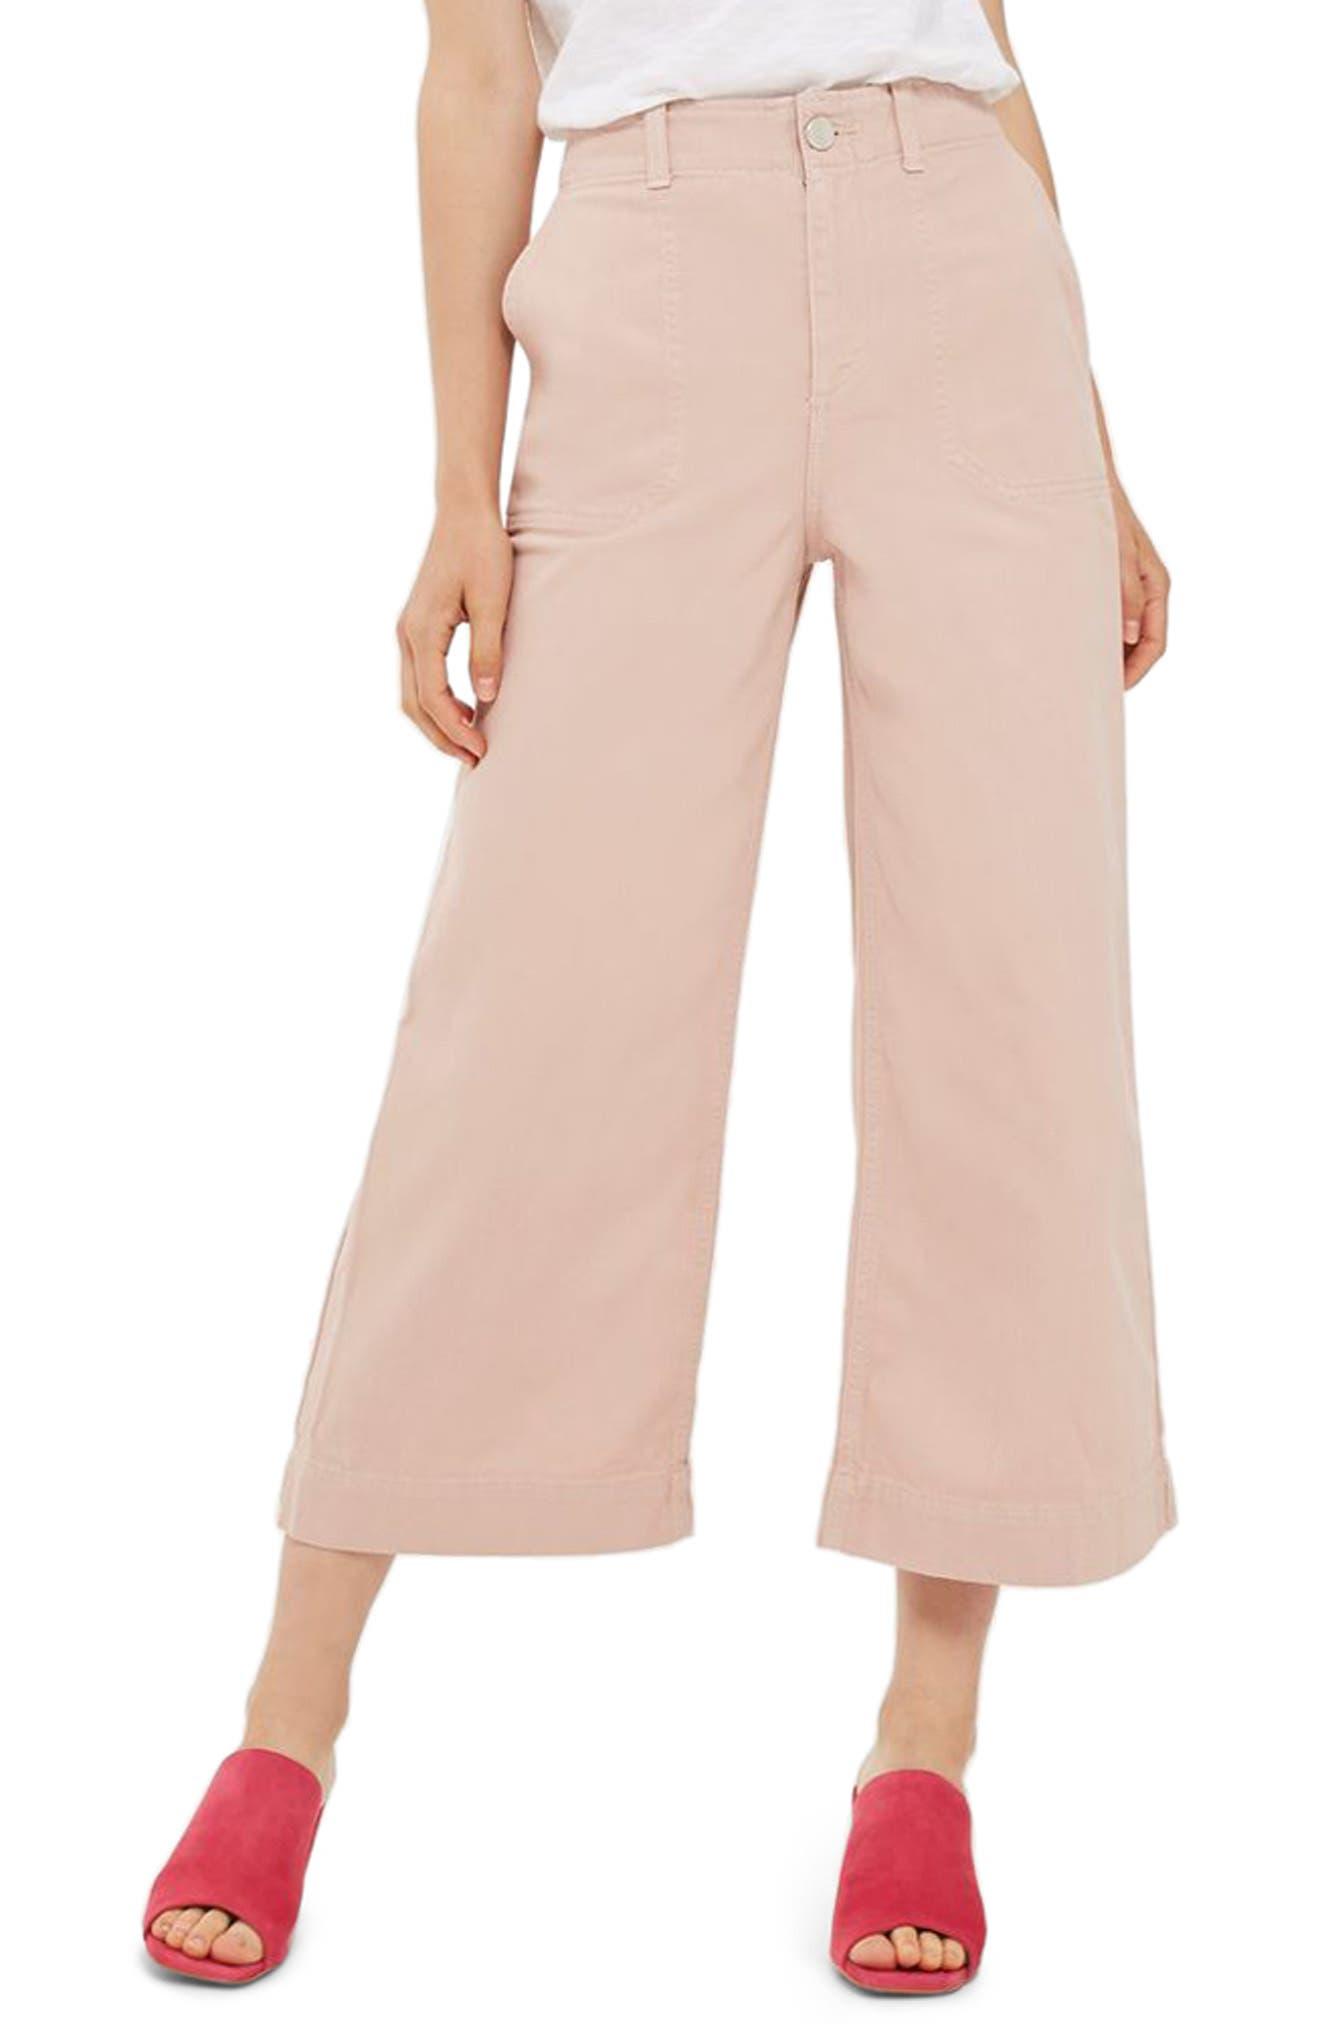 Topshop Sailor Crop Trousers (Regular & Petite)